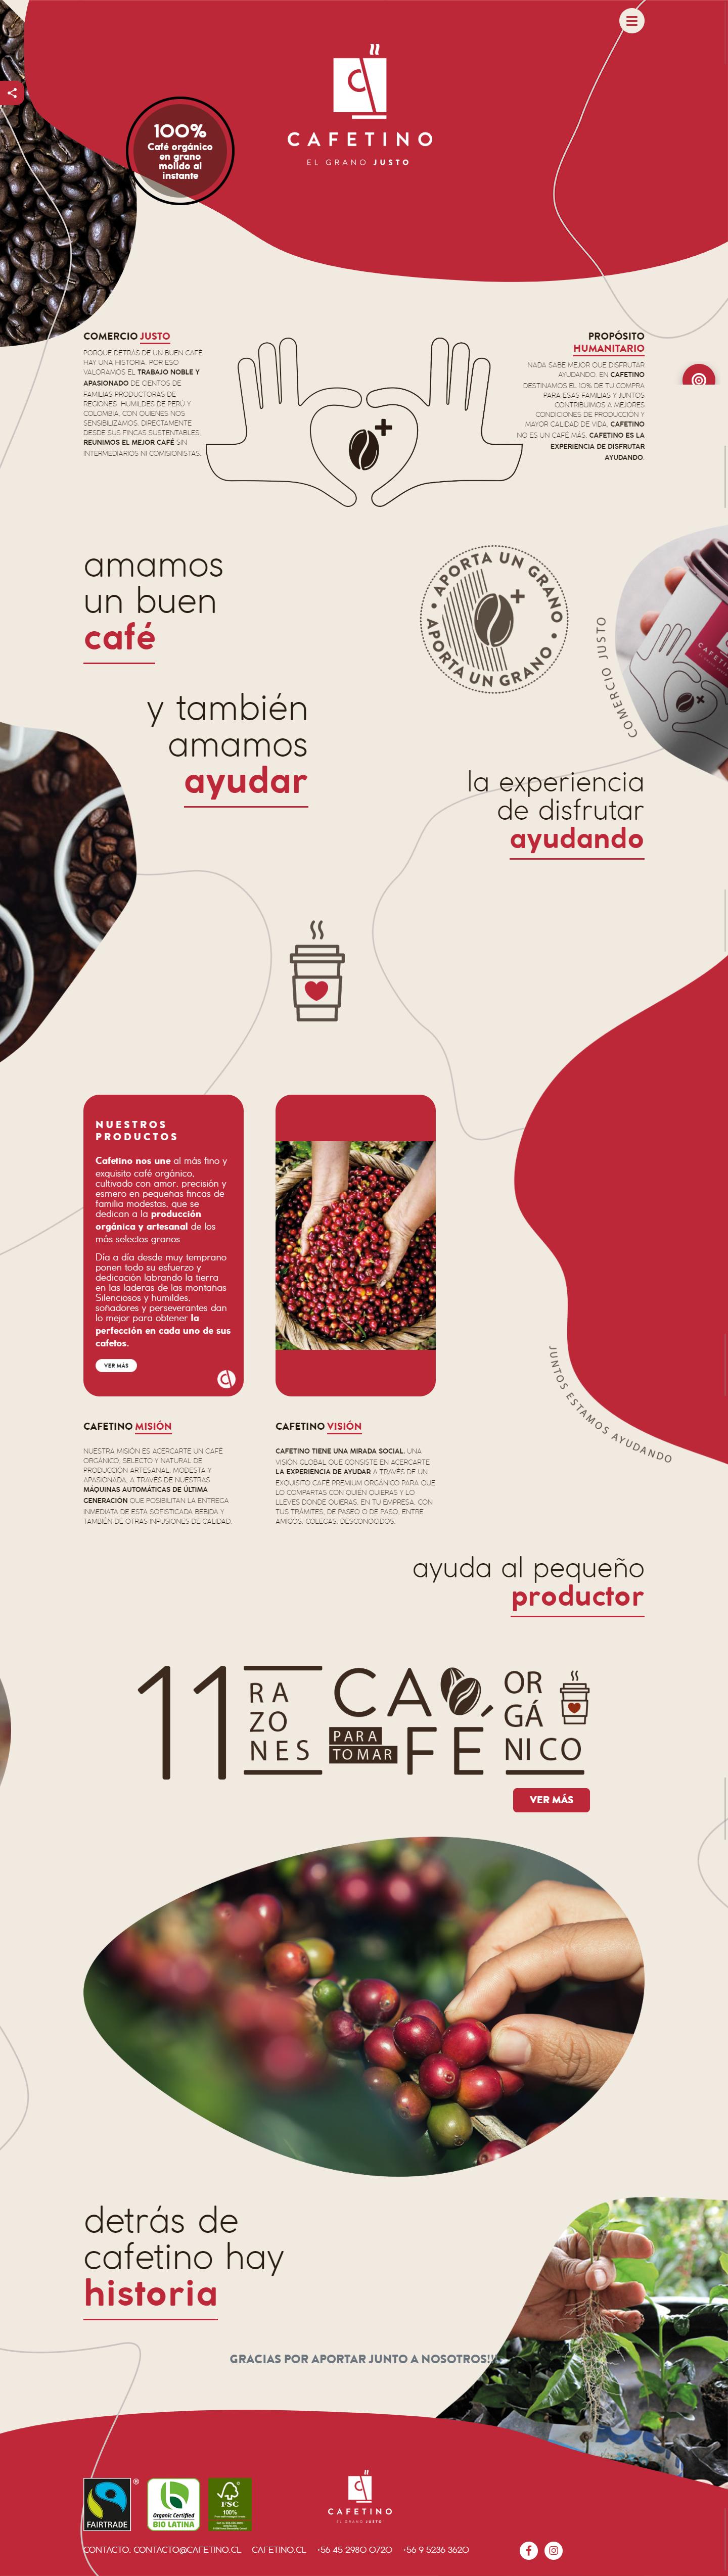 Sitio web Cafetino